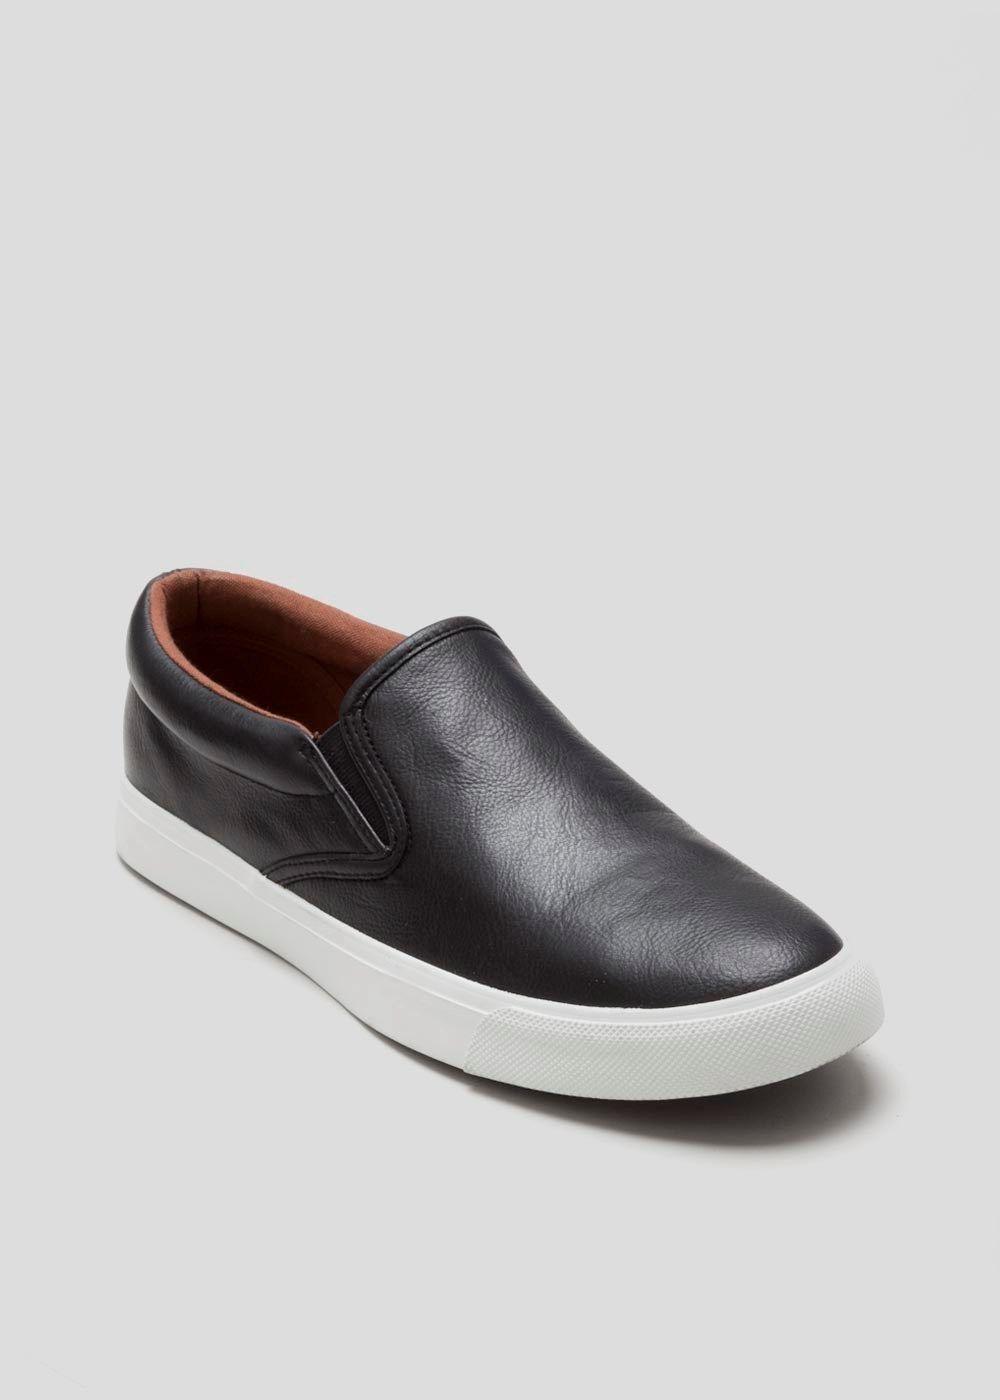 Slip on pumps, Boots men, Stylish men